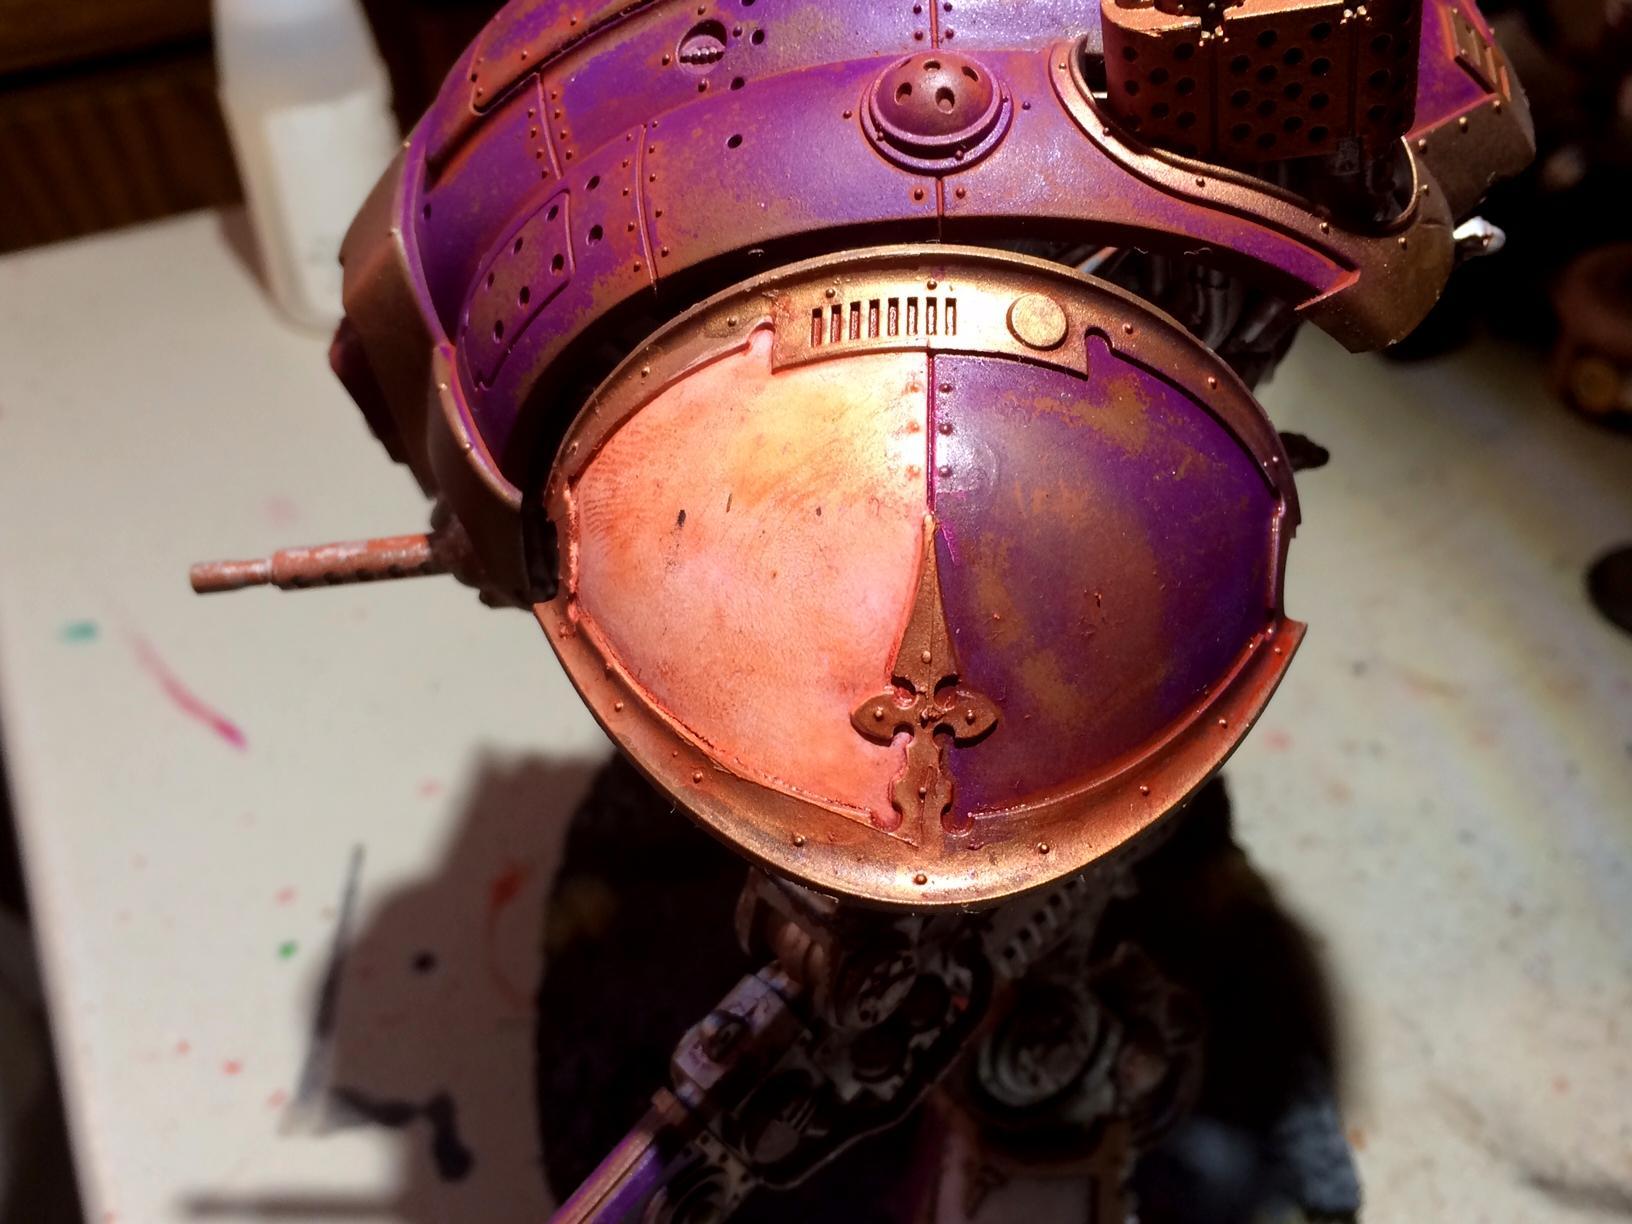 Detail, Imperial Knight, Pip, Purple, Rust, Warhammer 40,000